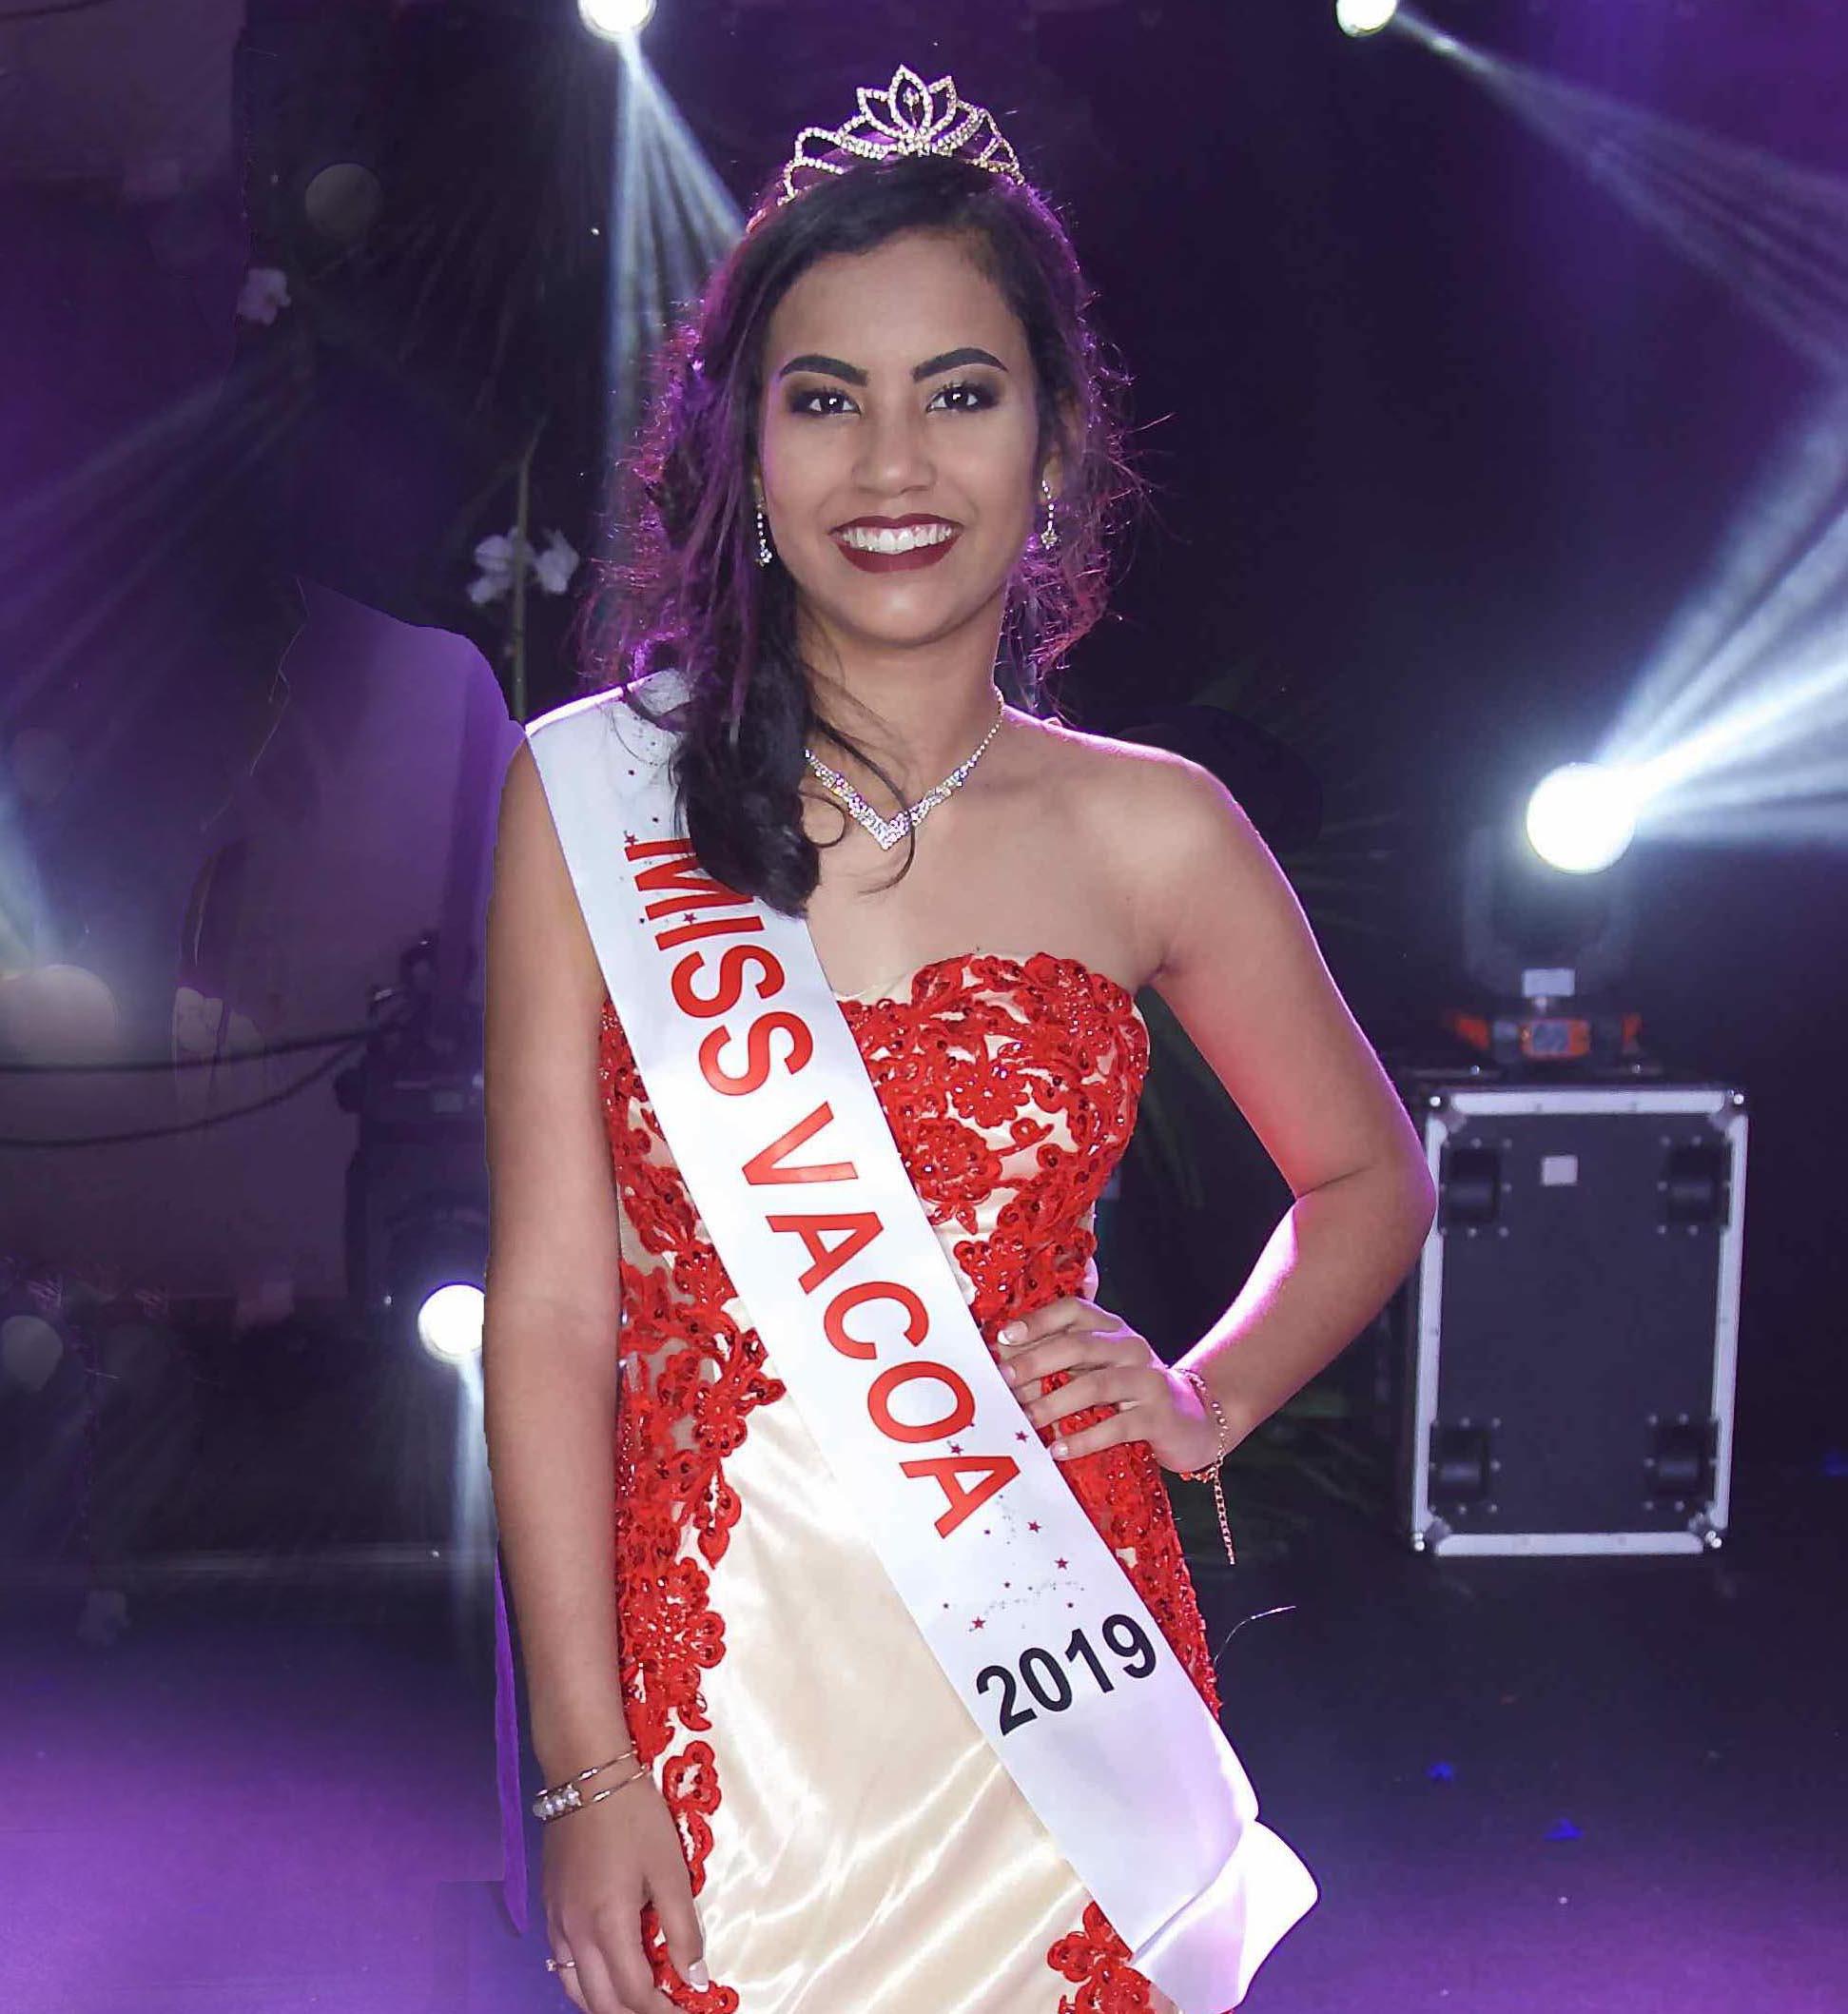 Frideline Mouniama, Miss Vacoa 2019